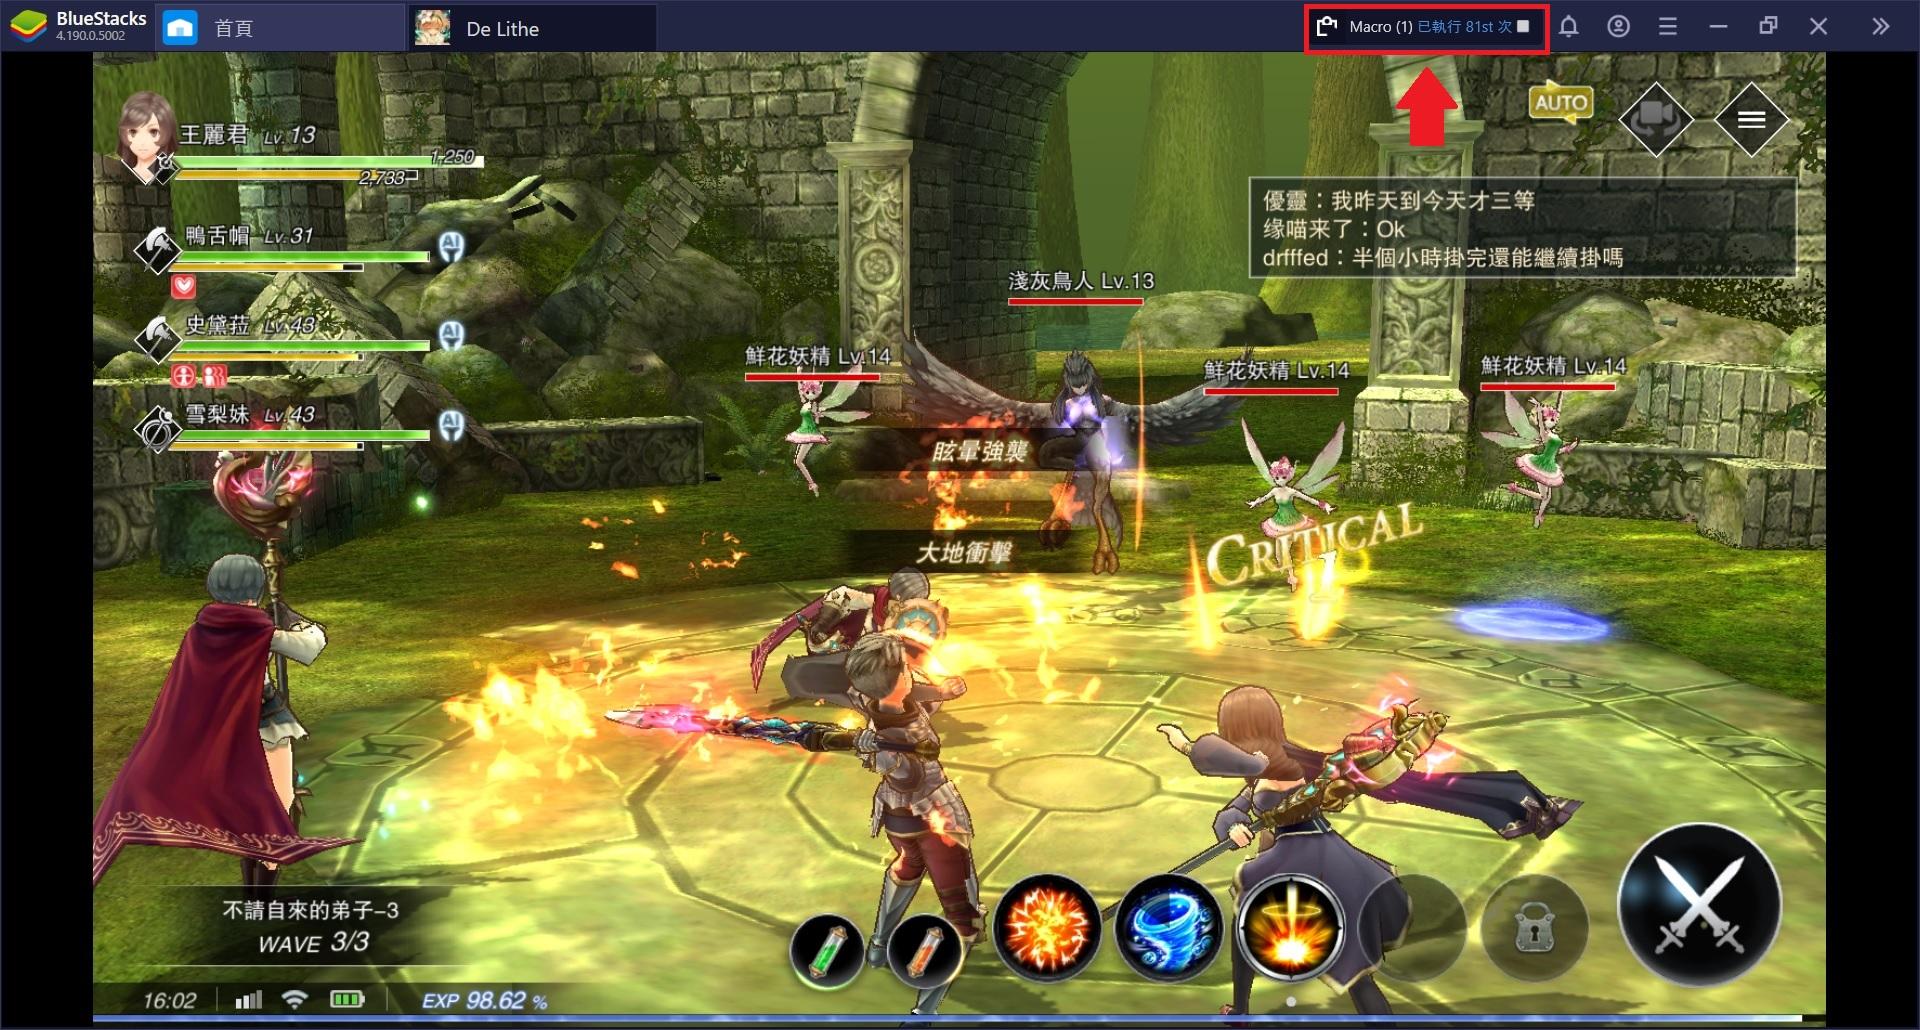 《De: Lithe~忘卻的真王與盟約的天使~》:新手玩家快速升級攻略